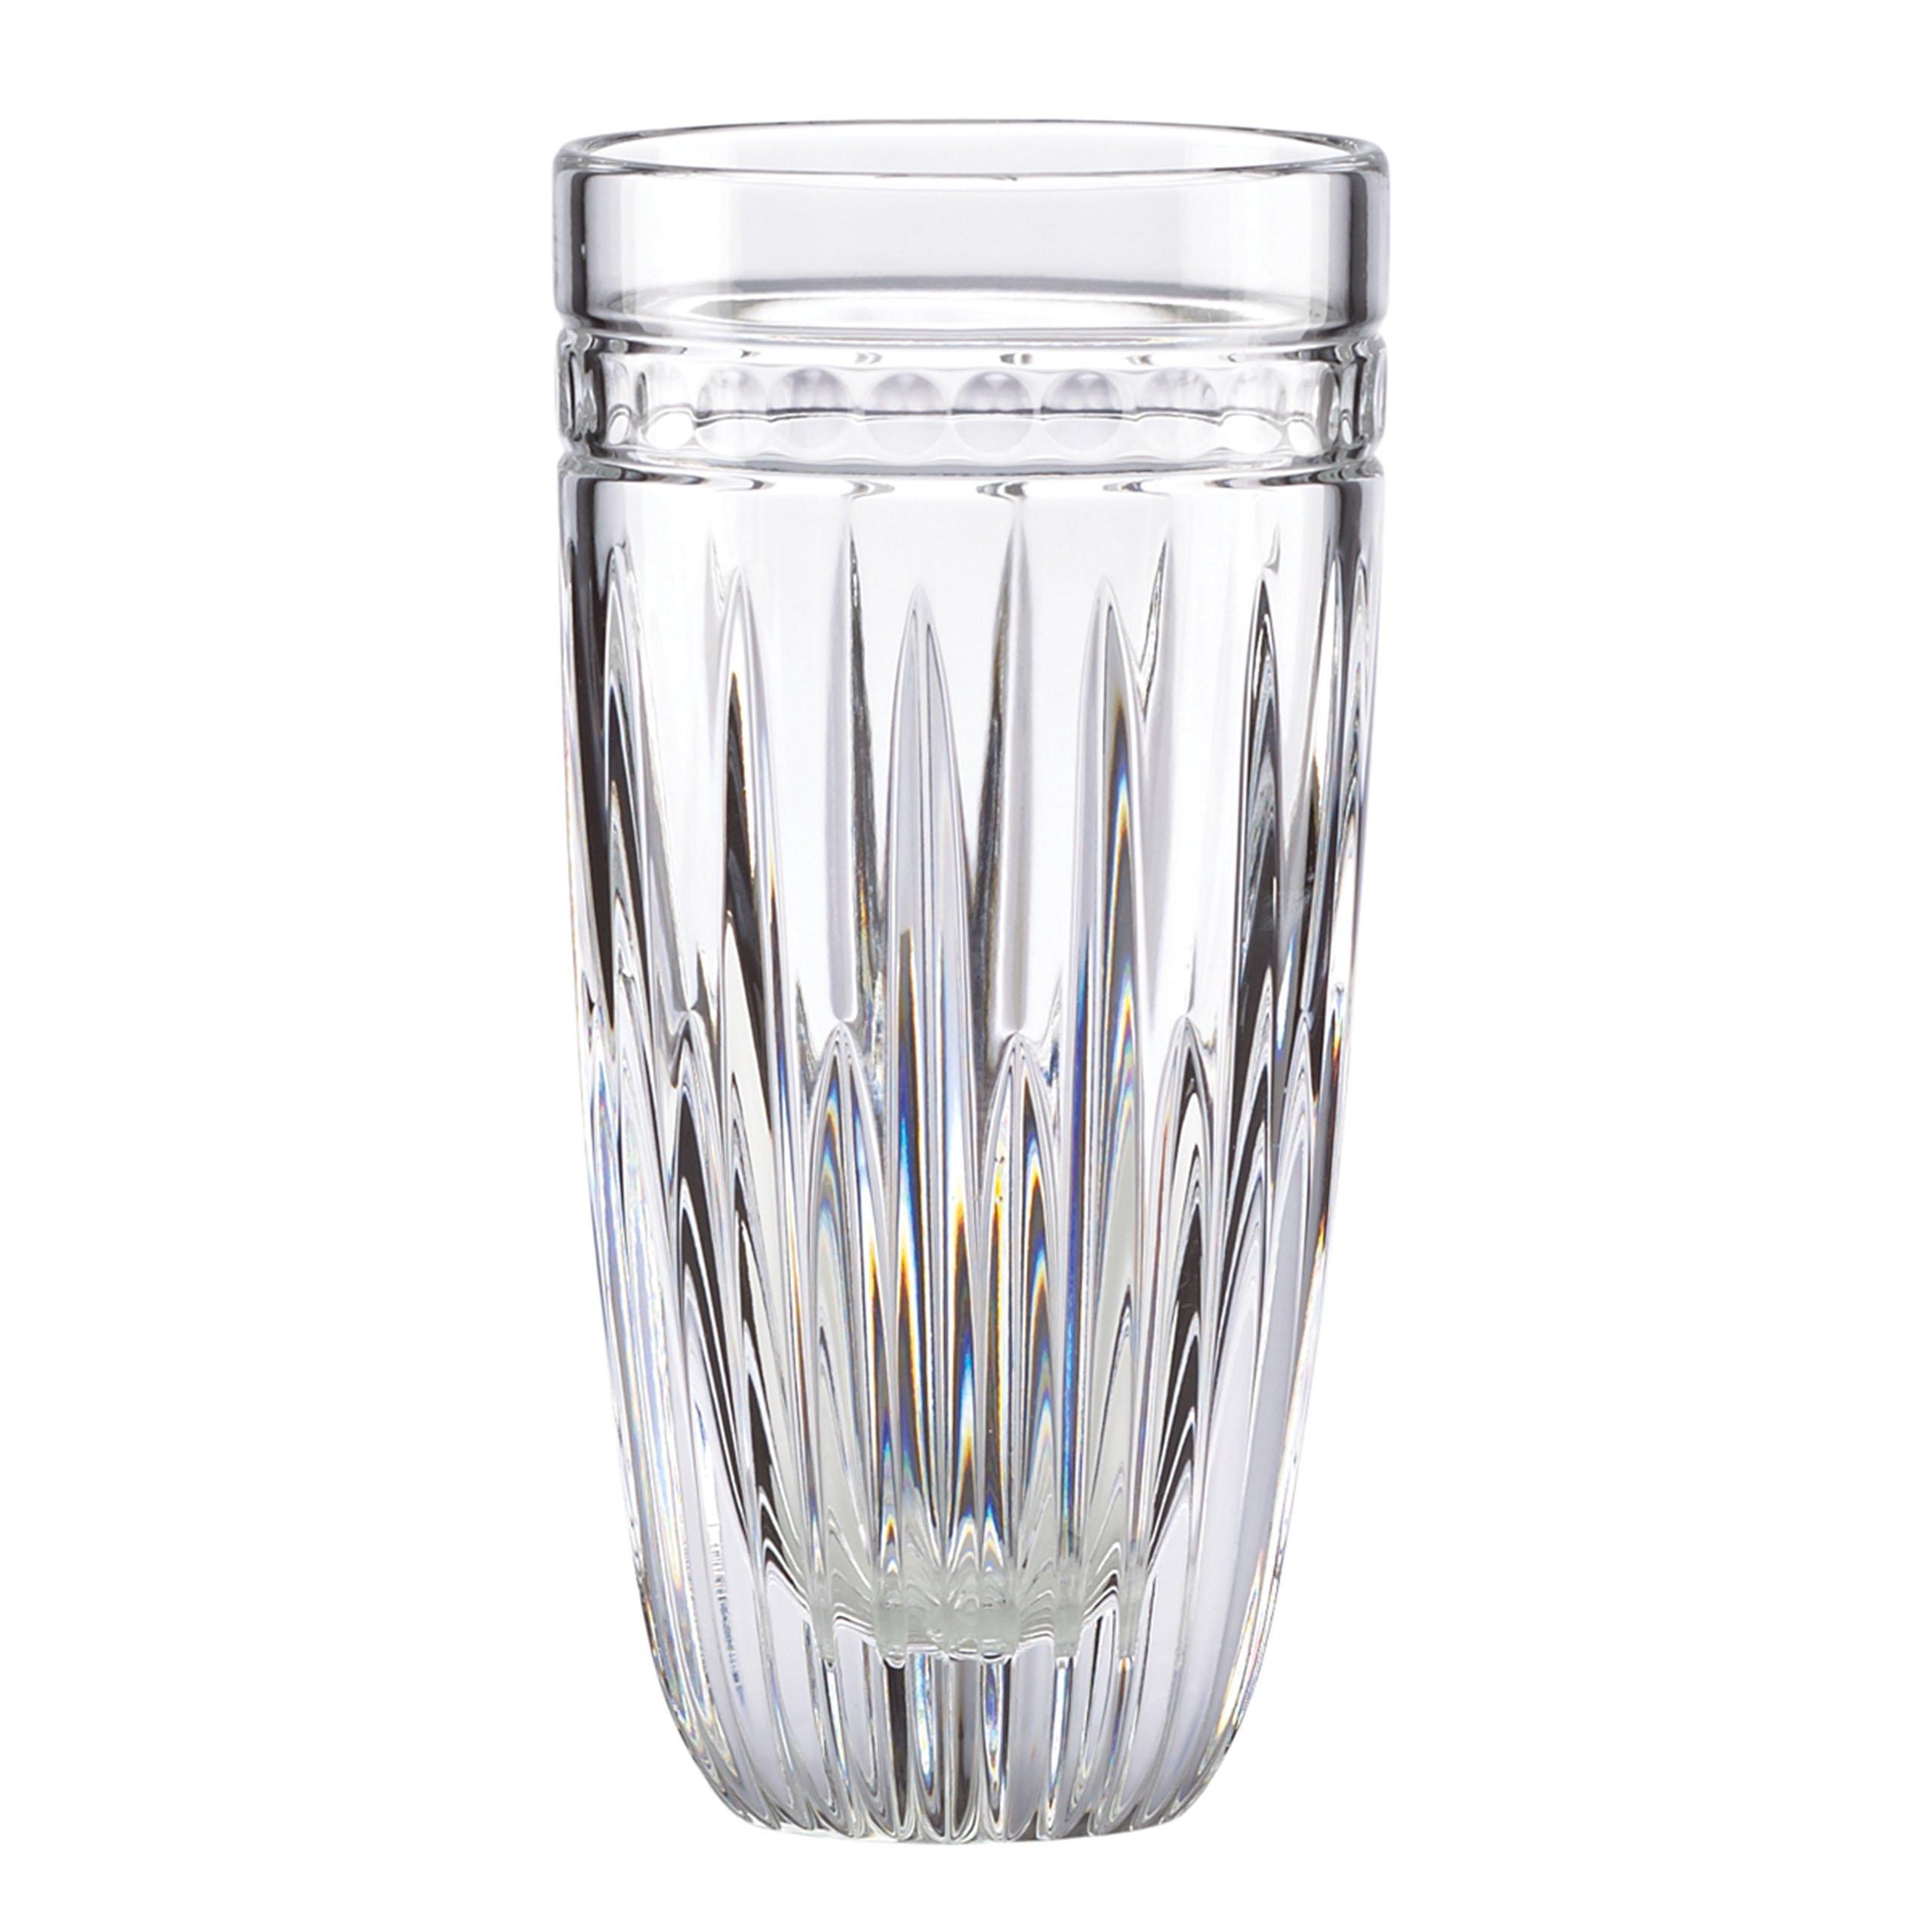 Lenox Vintage Jewel Highball Glass Set